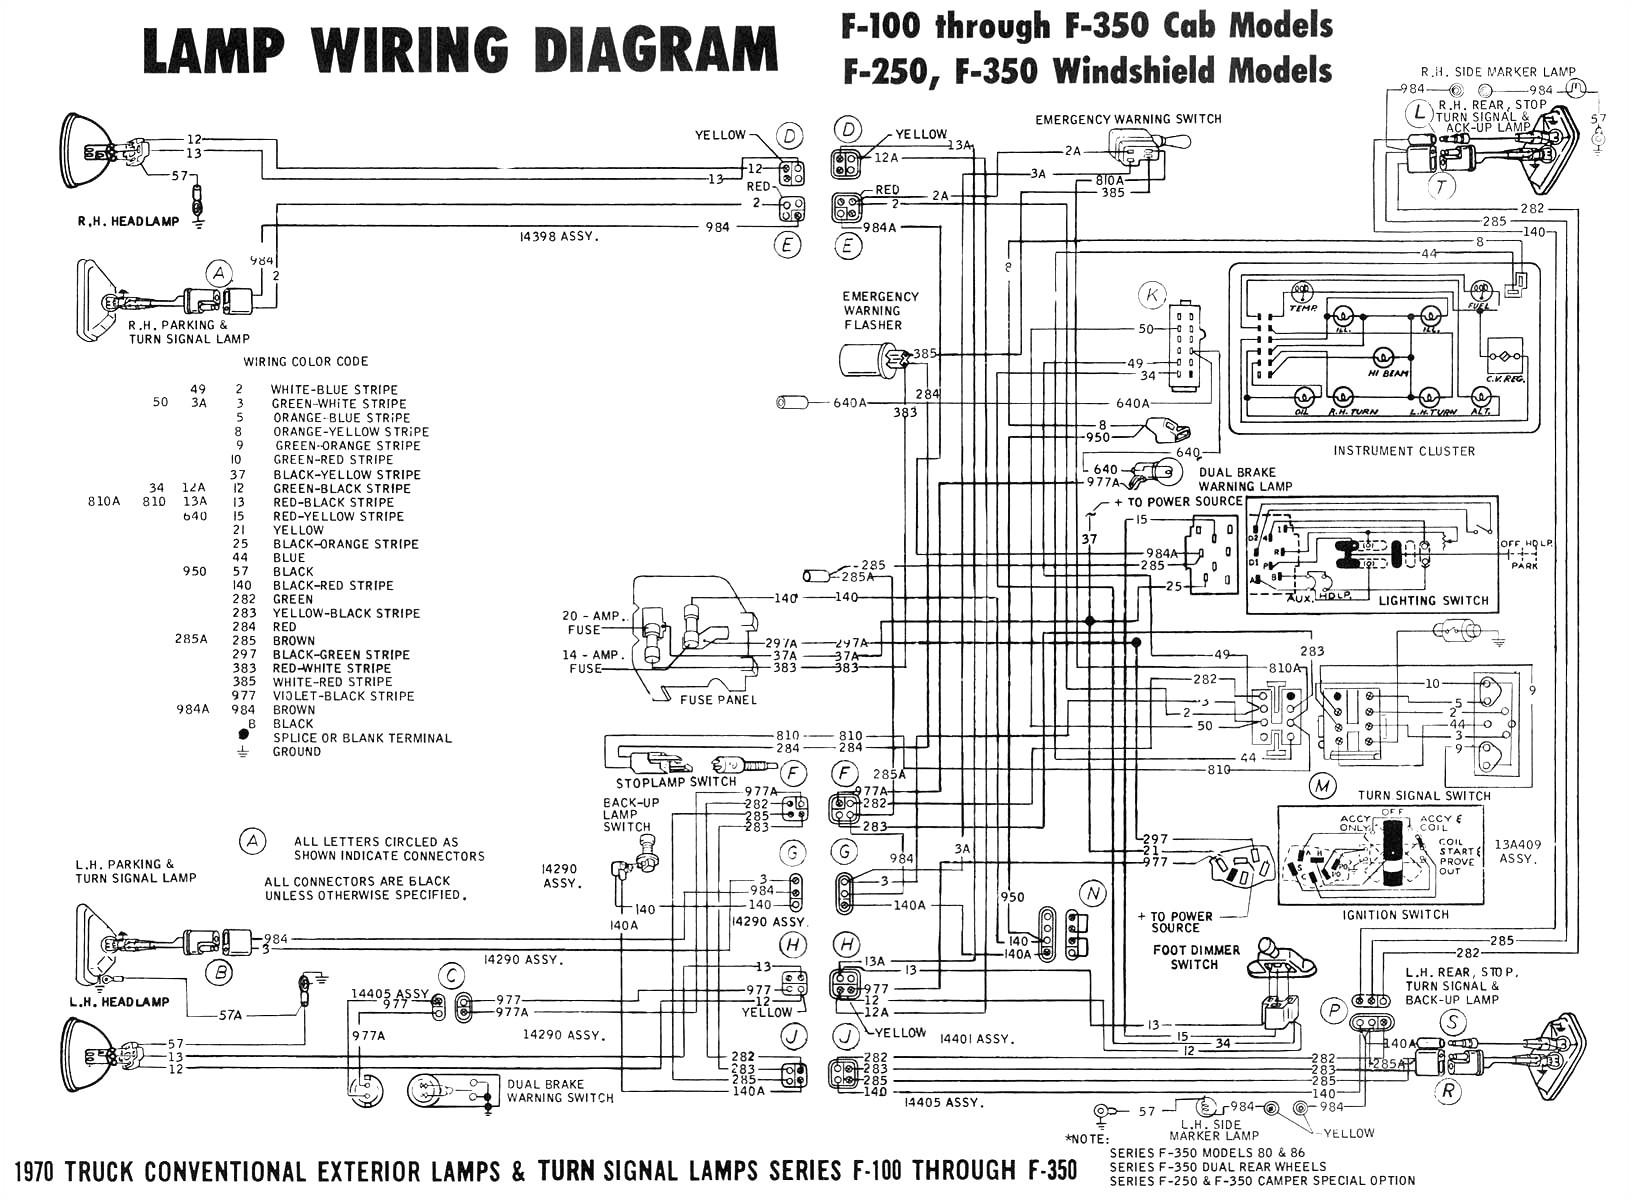 aldl wiring 1997 toyota 4runner wiring diagram mega wiring diagram moreover car electrical system diagram on e series